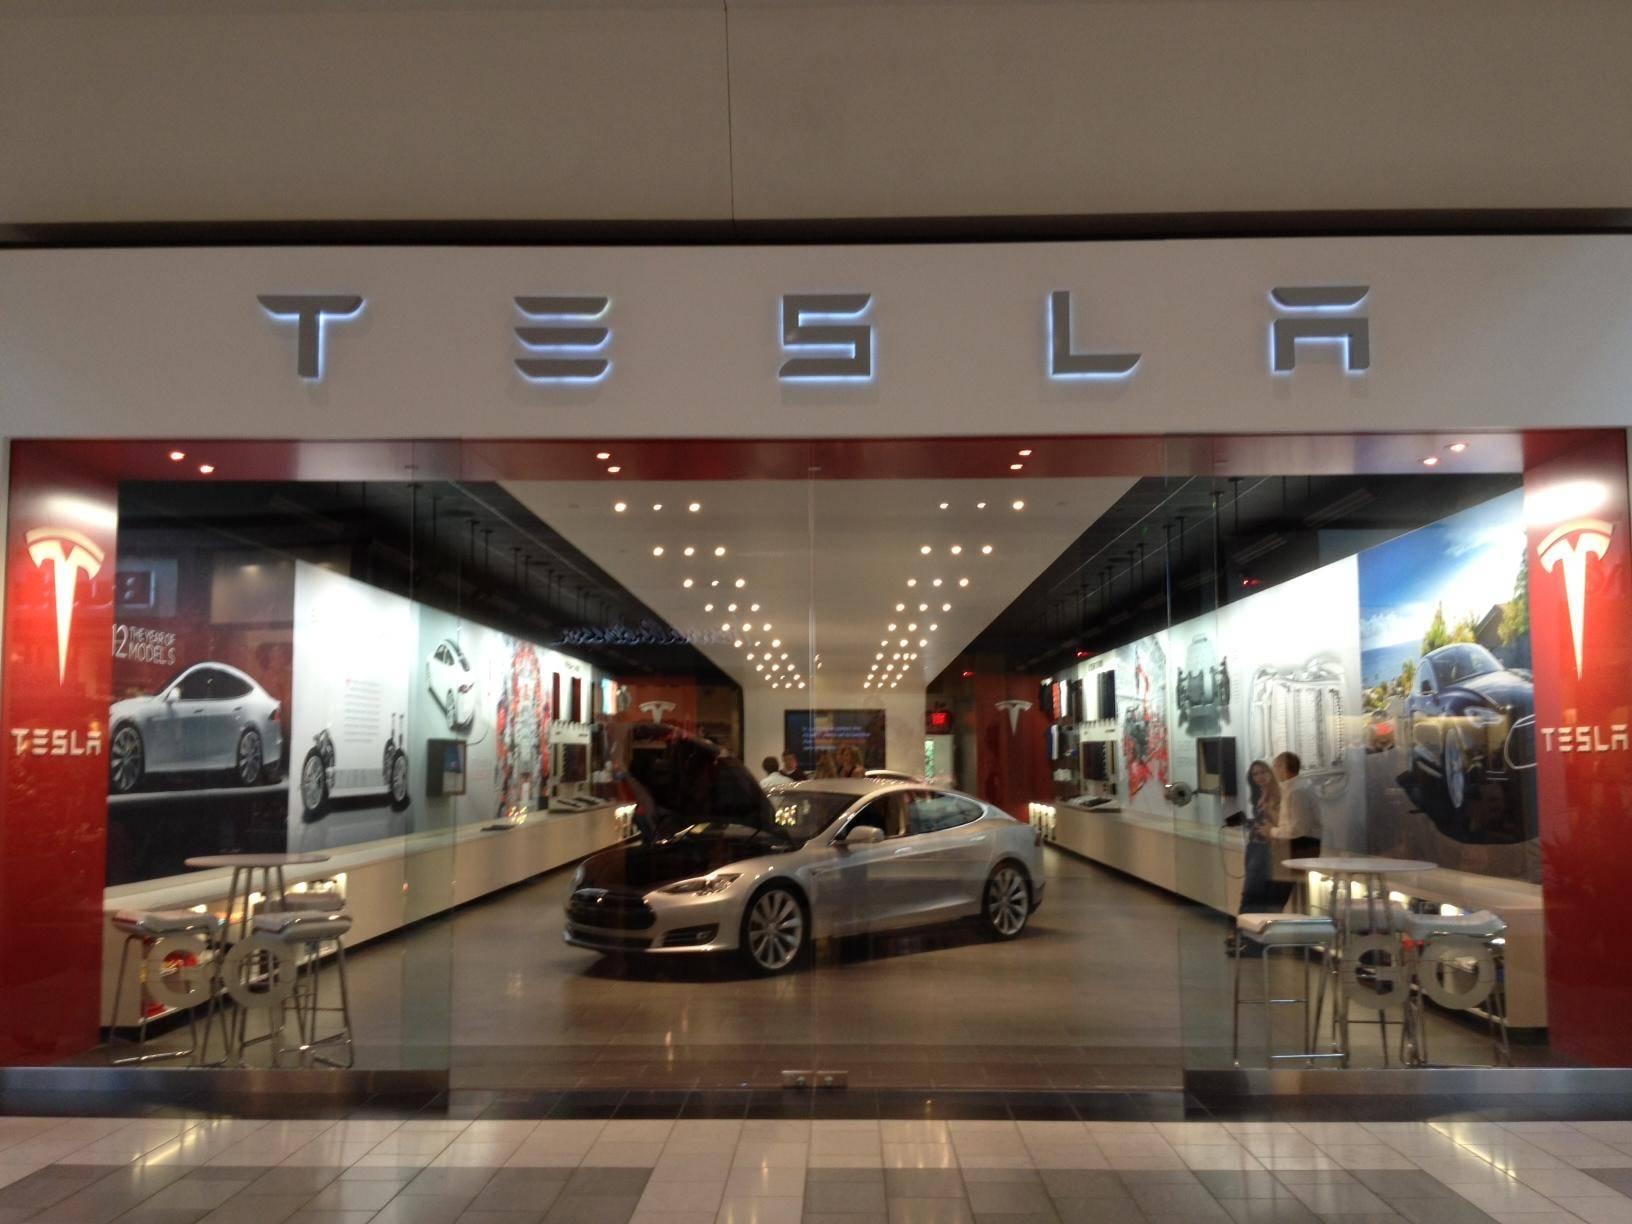 Motors-in-the-mall-Tesla-hawks-Model-S-like-Macbooks-with-dedicated-retail-space